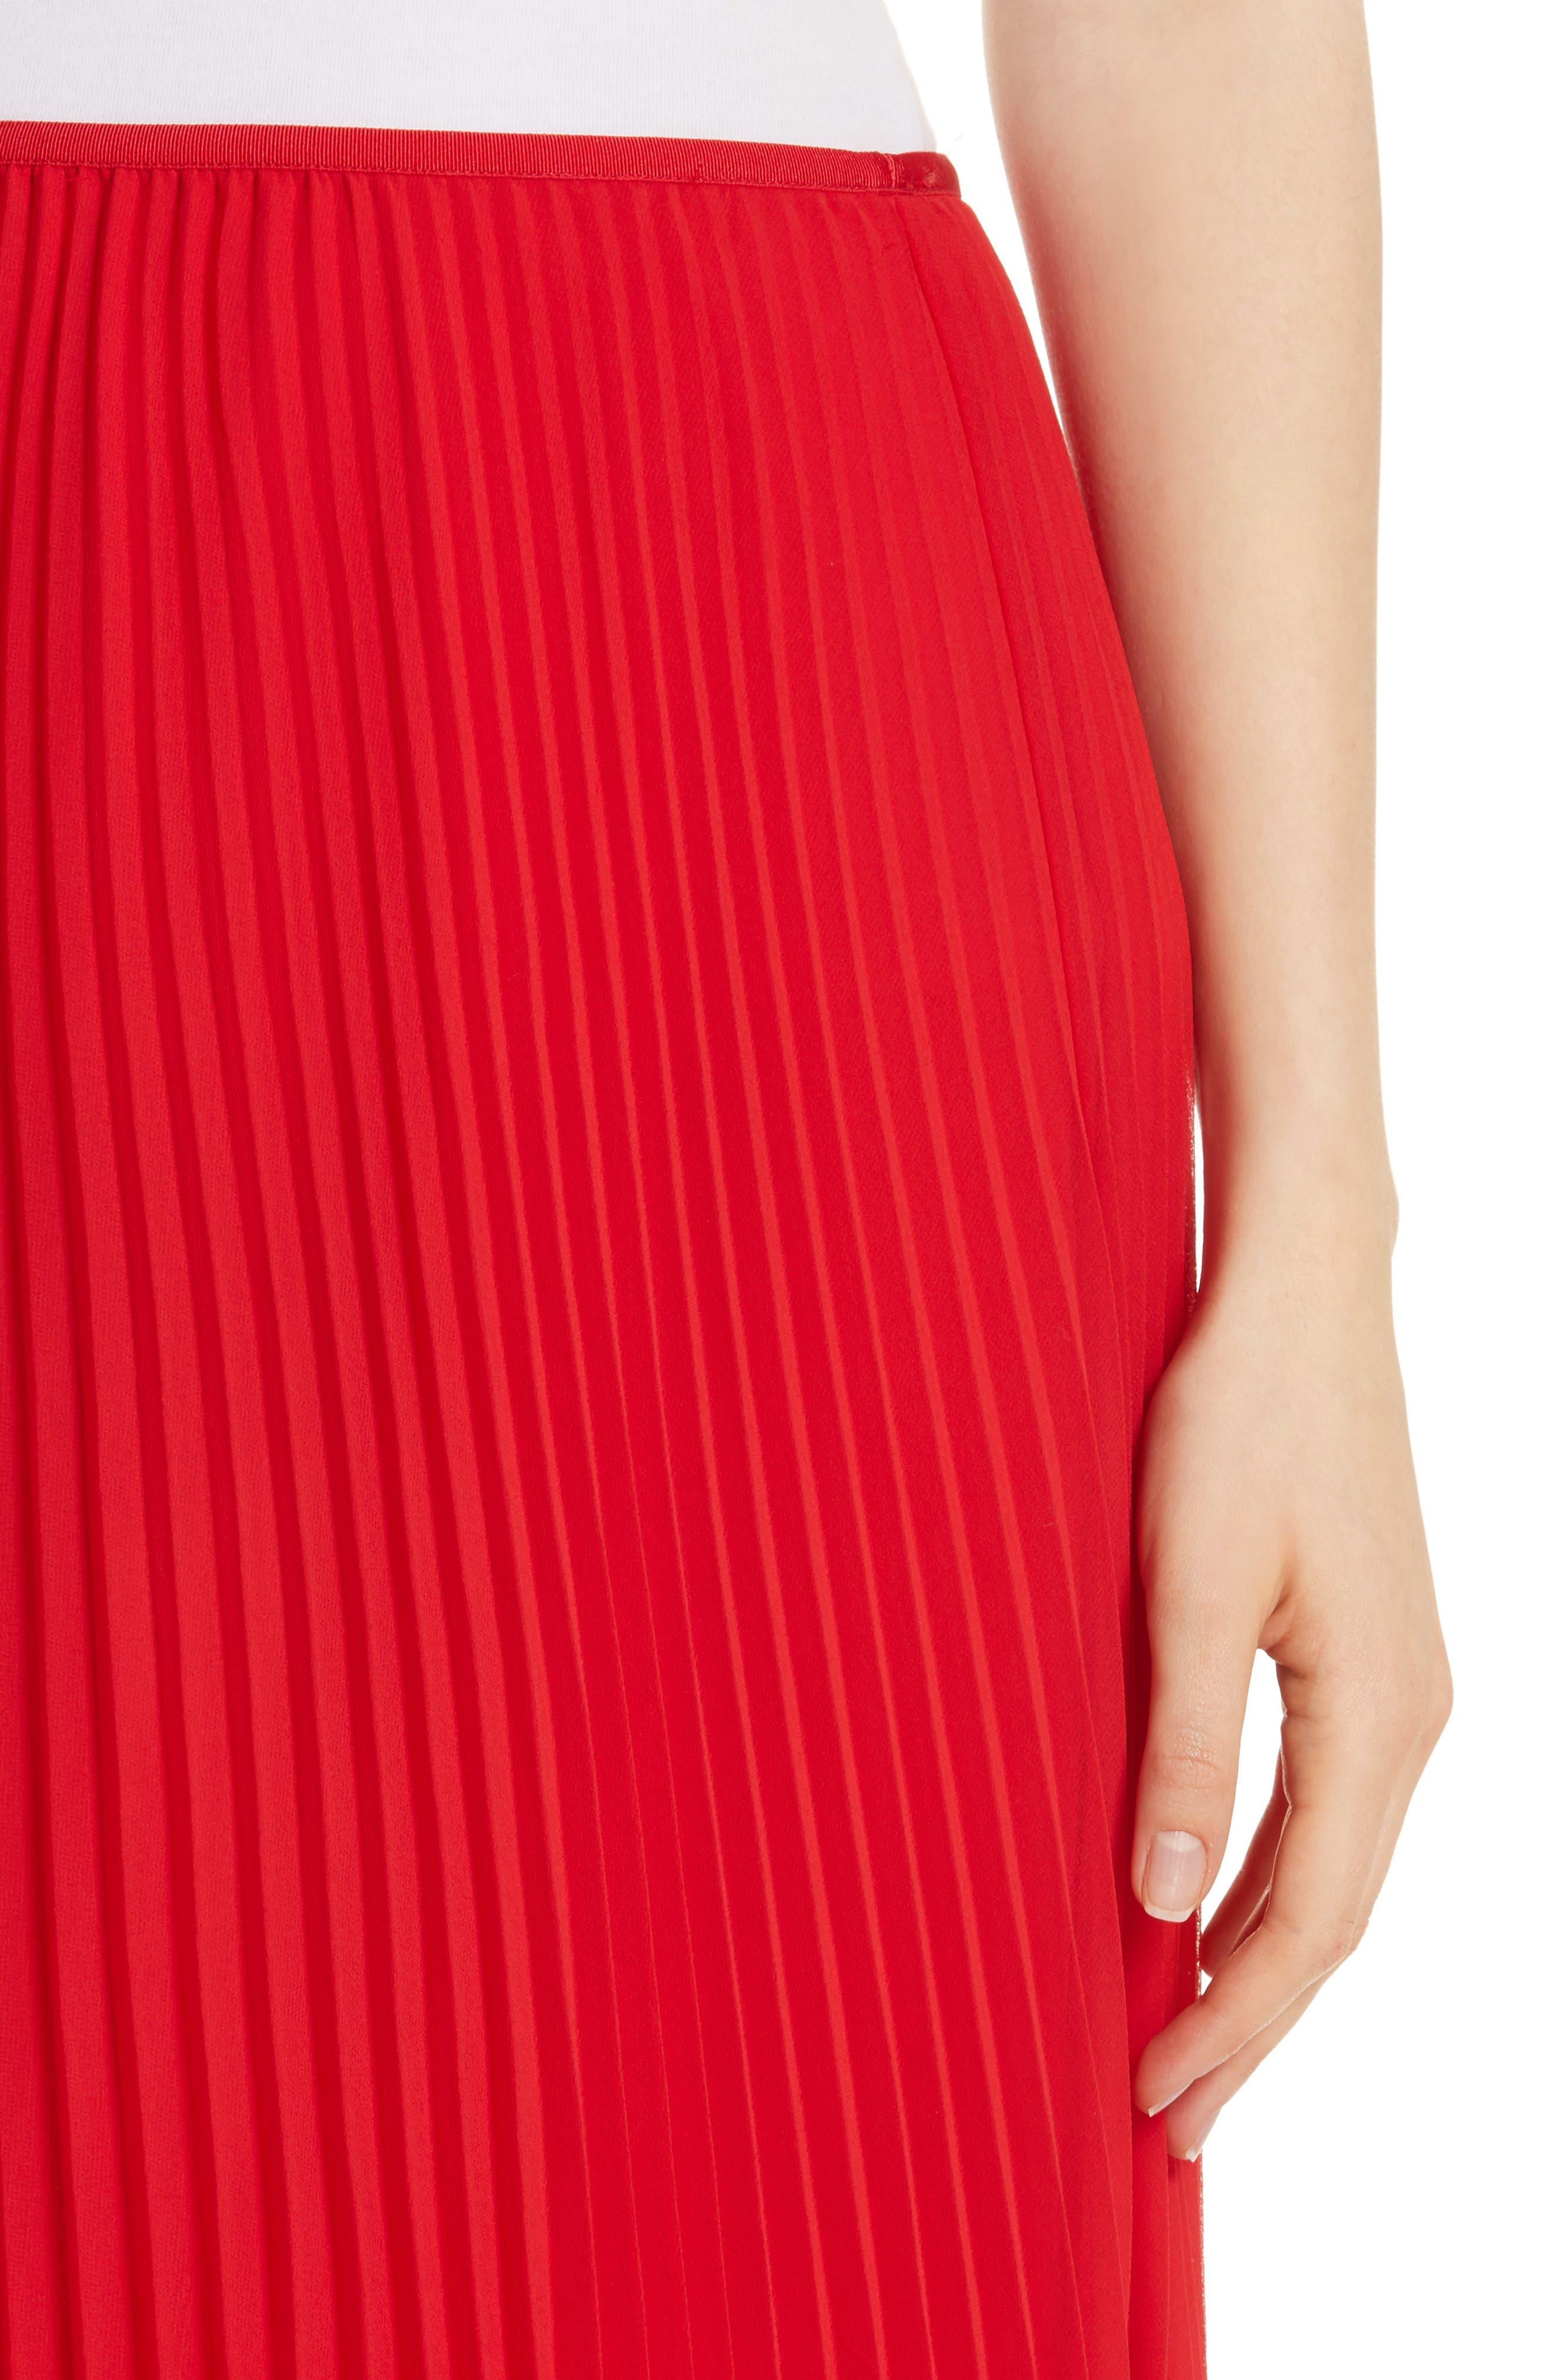 POLO RALPH LAUREN, Pleat Midi Skirt, Alternate thumbnail 4, color, PANDORA RED